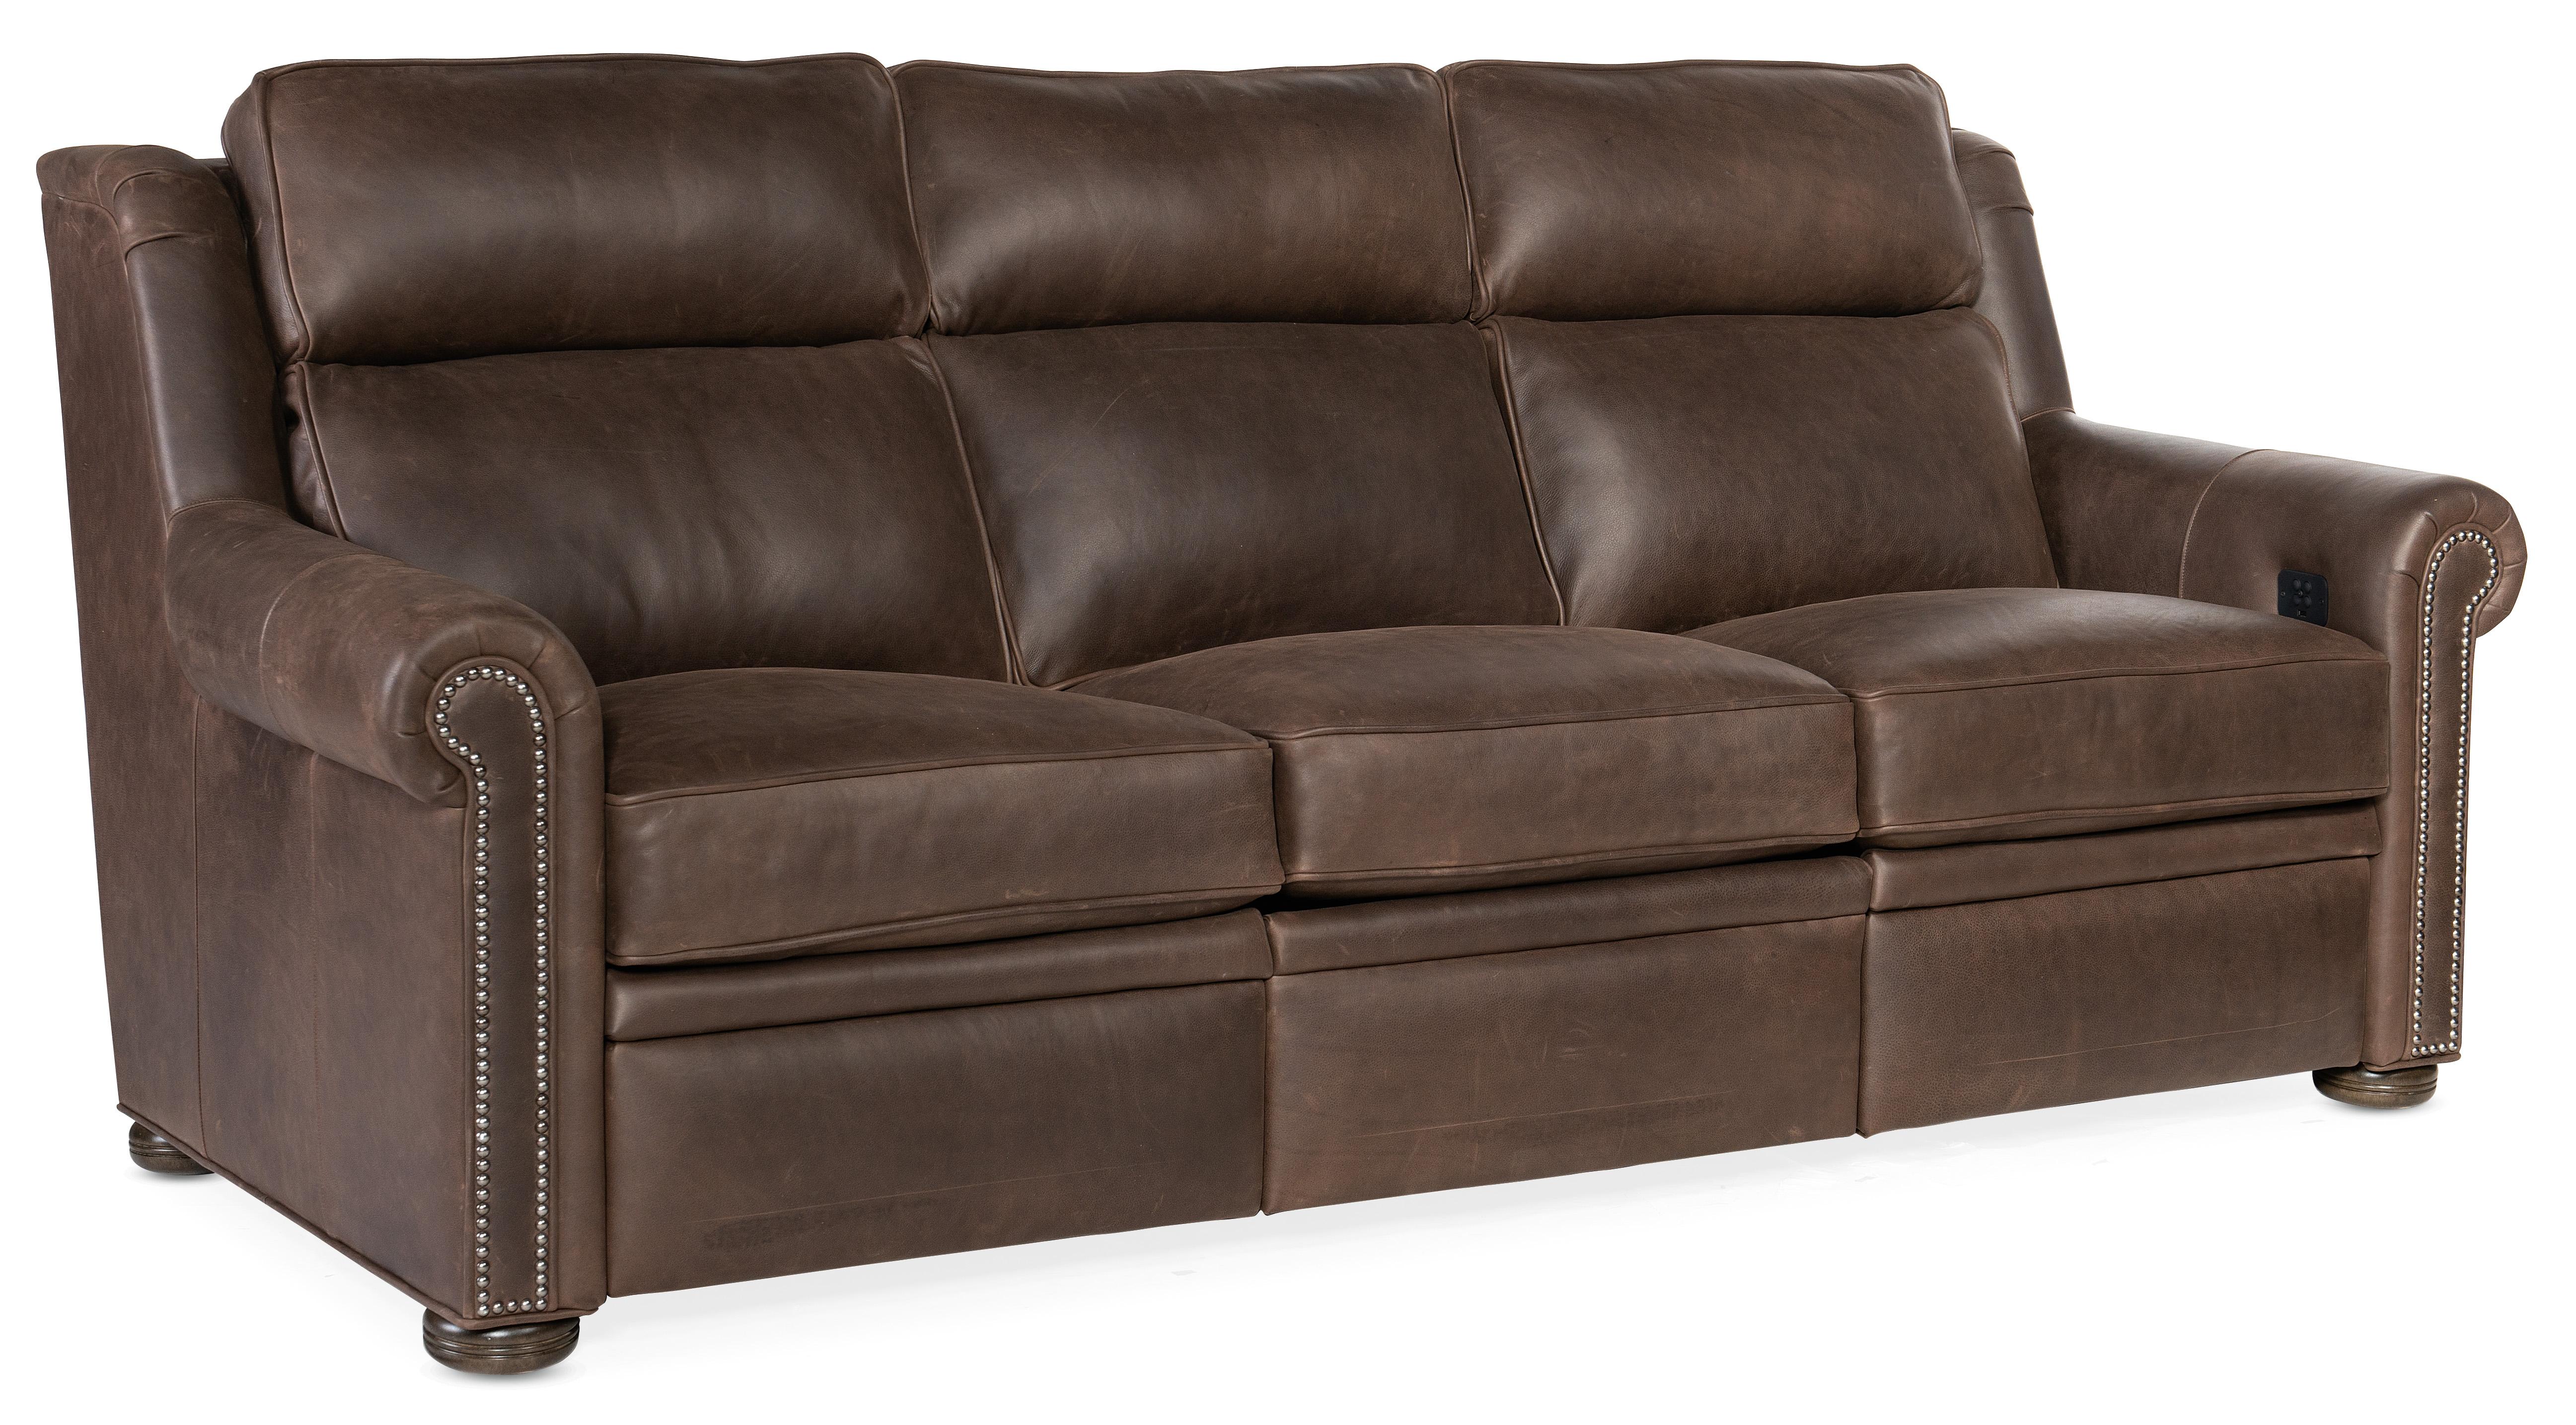 Reece Power Reclining Sofa w/ Power Headrest by Bradington Young at Belfort Furniture